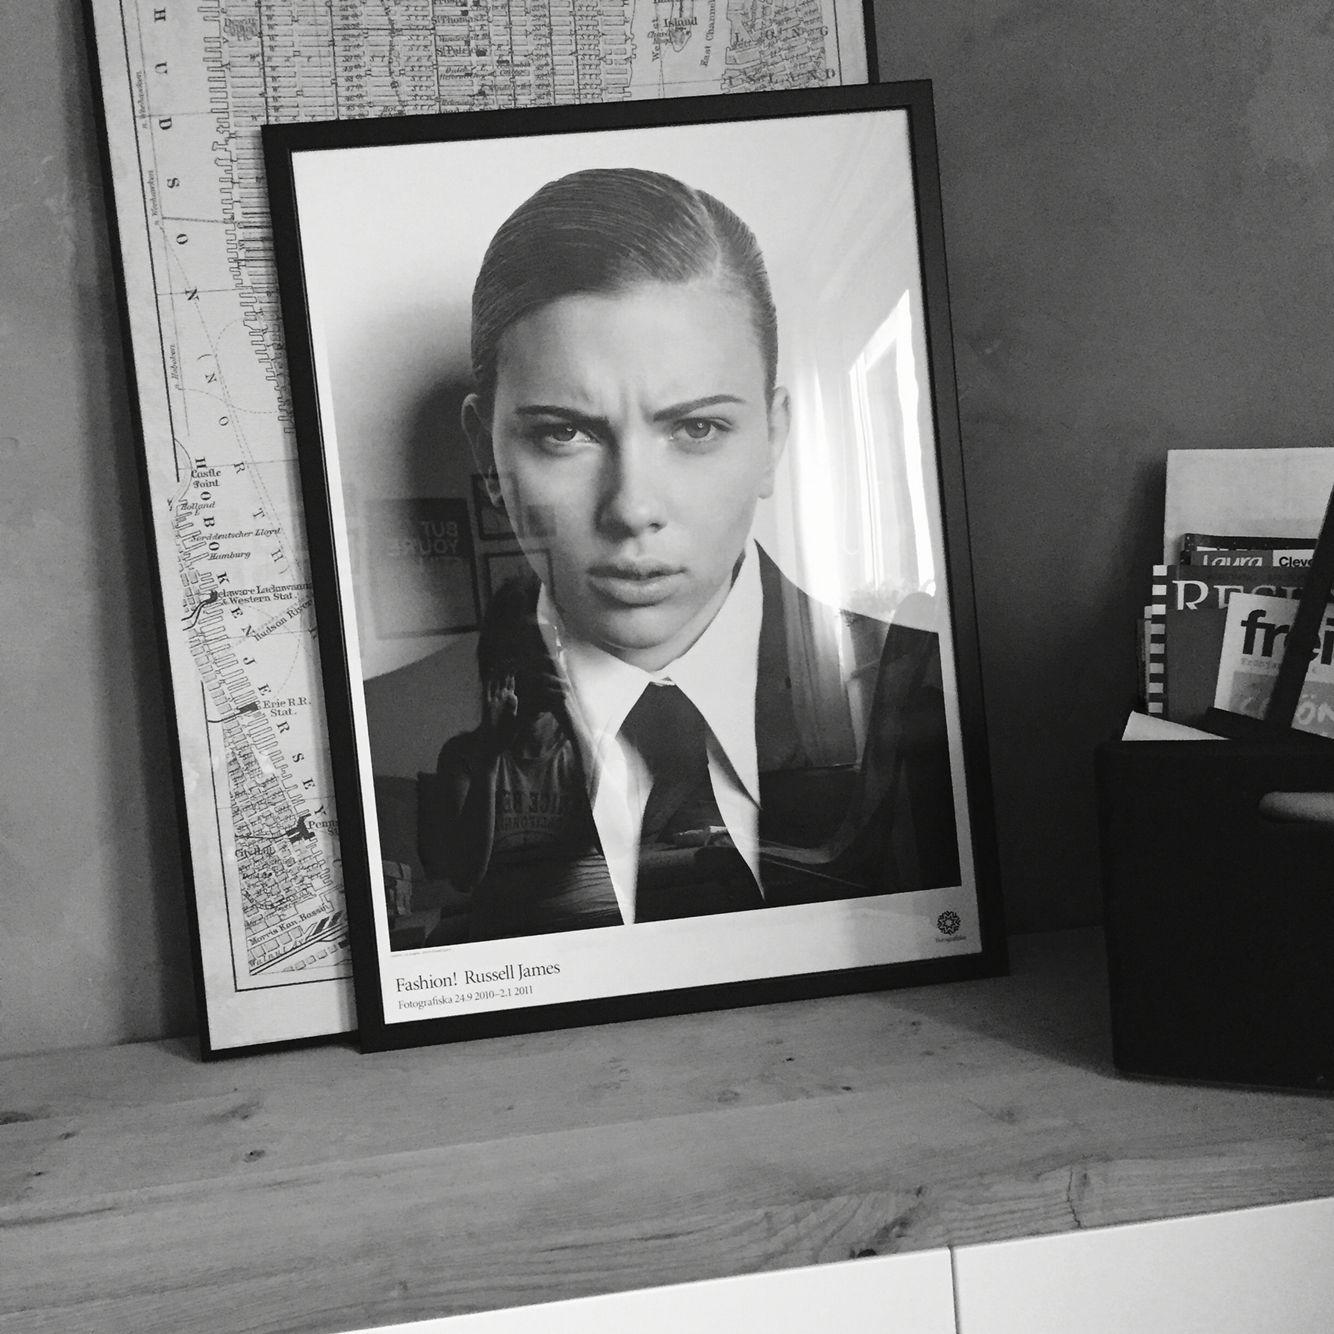 Scarlett Johansson #ikea Frame #fotografiska Museum Schweden #stockholm #scandinavian Design #interior  New York map #besta